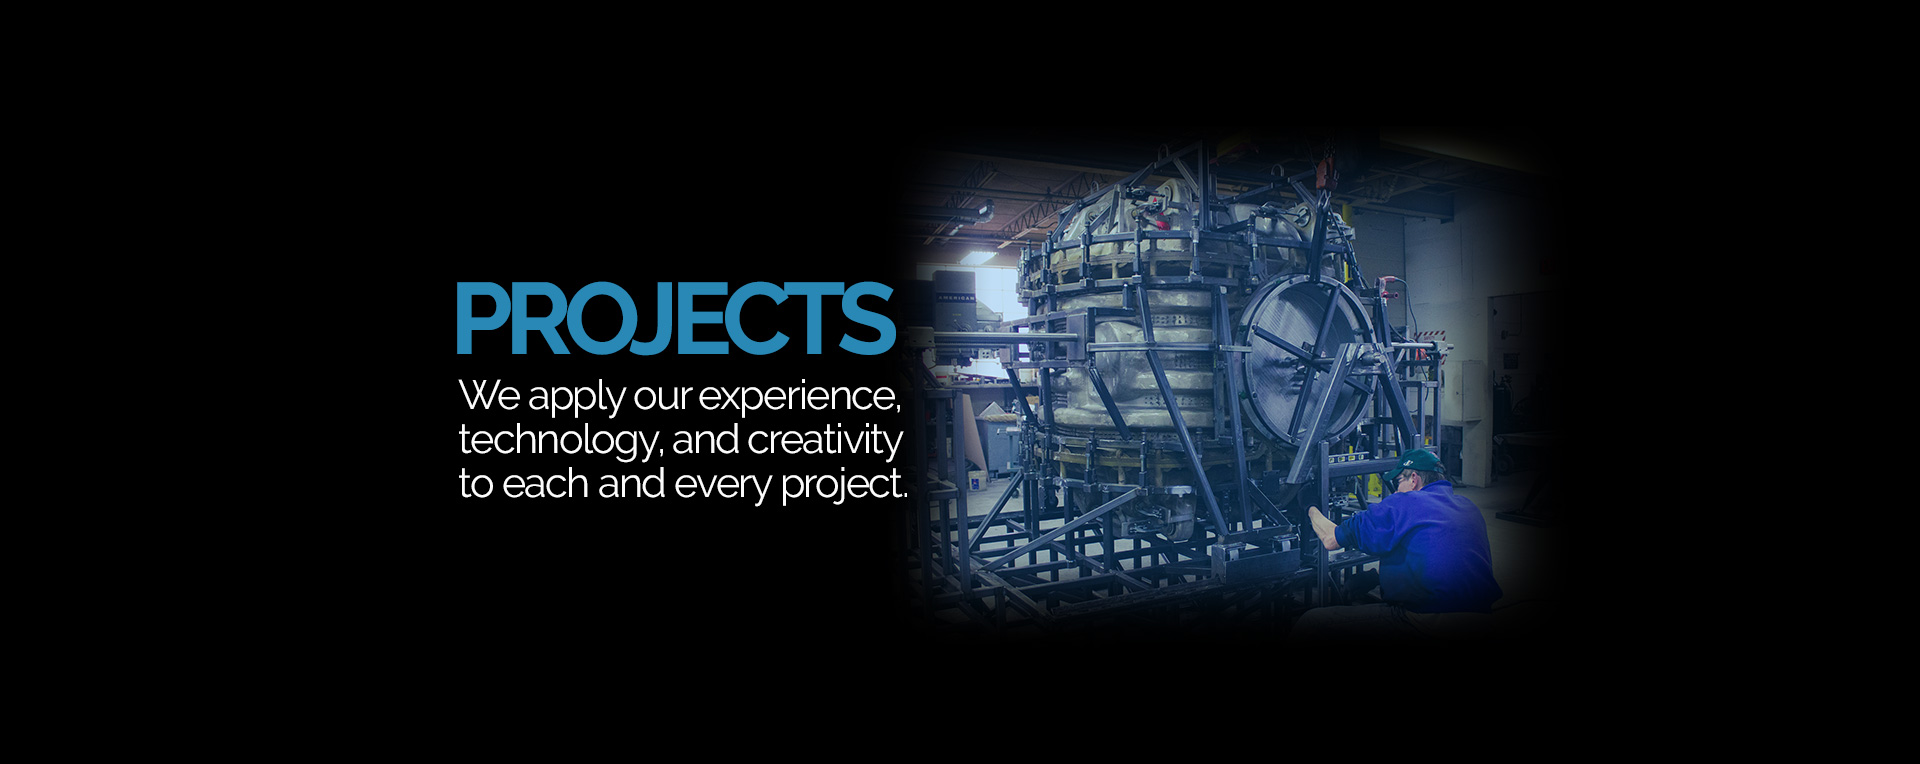 ProjectsSolutionsHeader_1920x764_Smaller